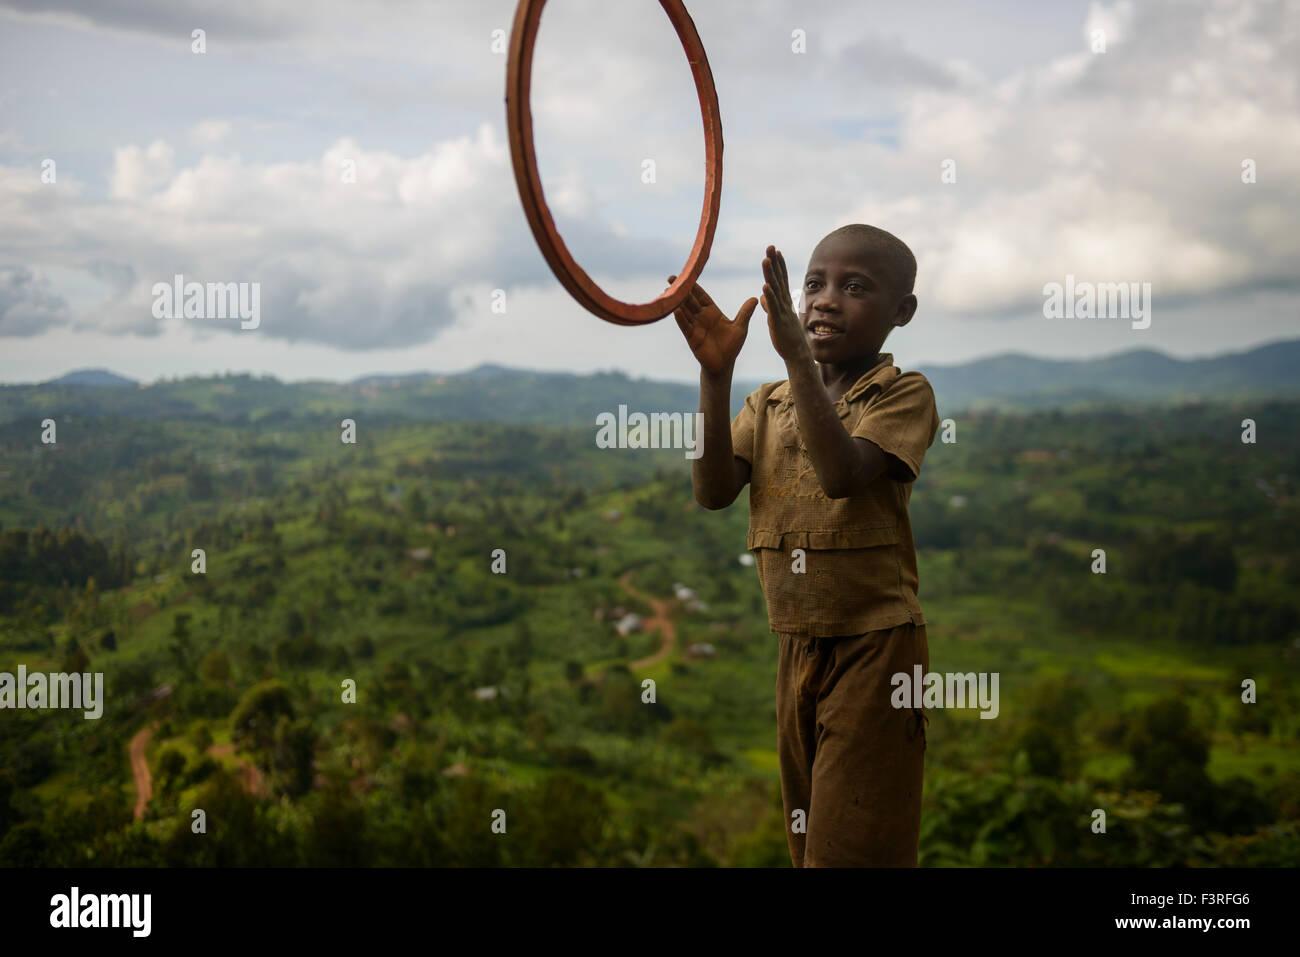 Kid playing with a hoop, Uganda, Africa - Stock Image